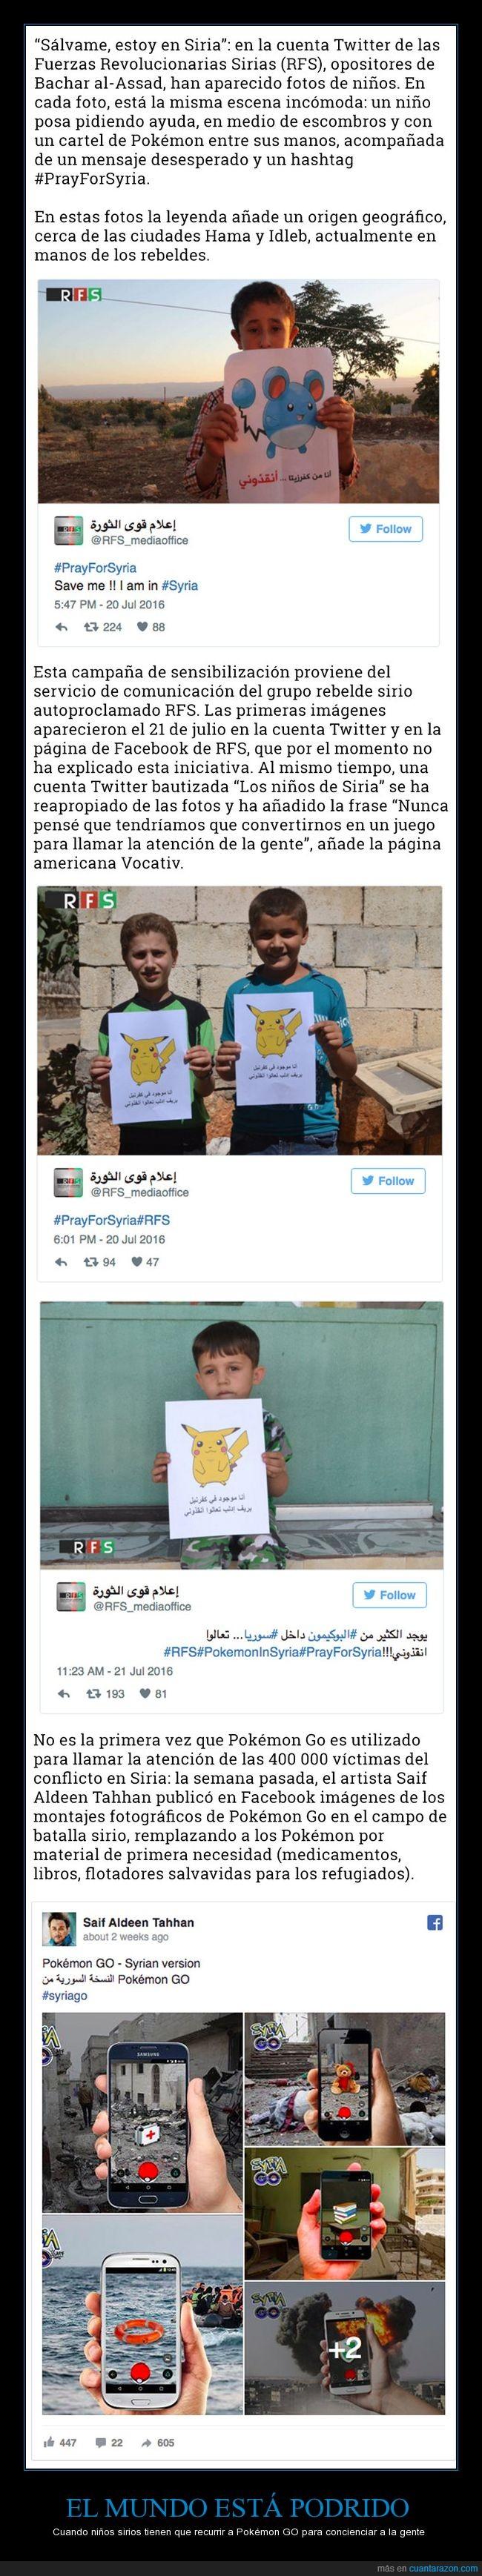 ayuda,pokémon go,siria